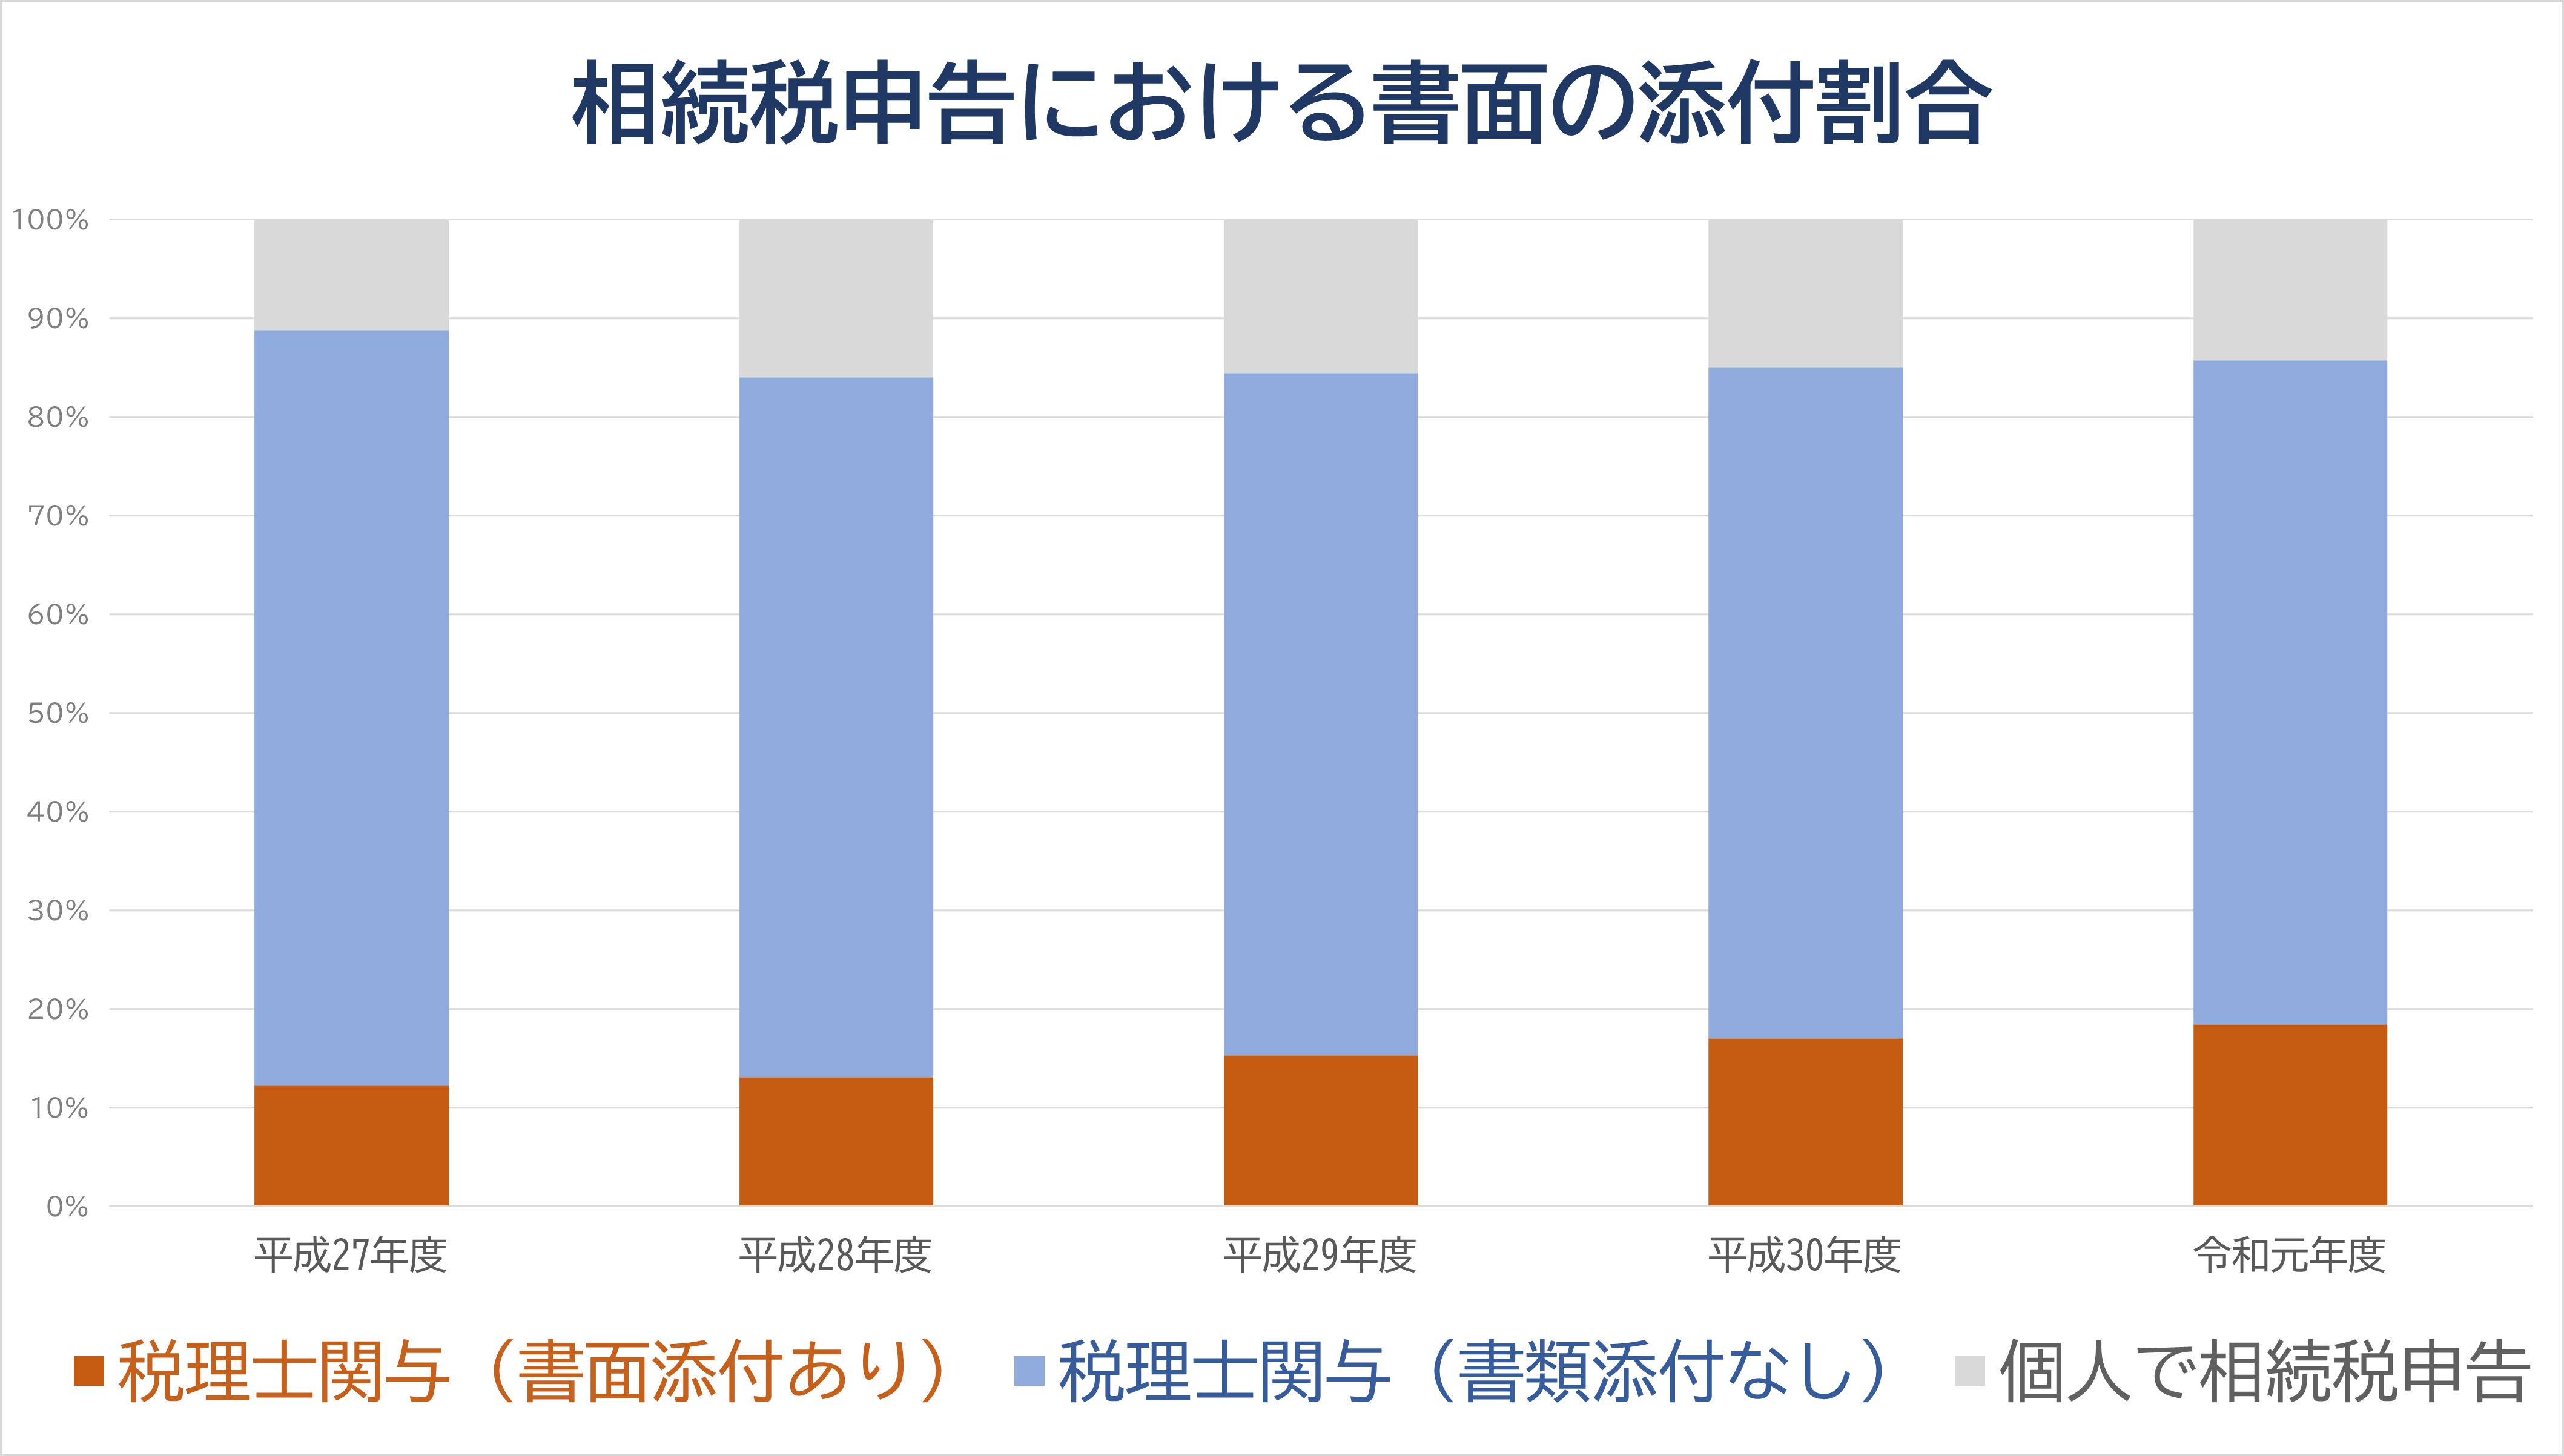 1_相続税申告の際の書面添付制度の適用割合